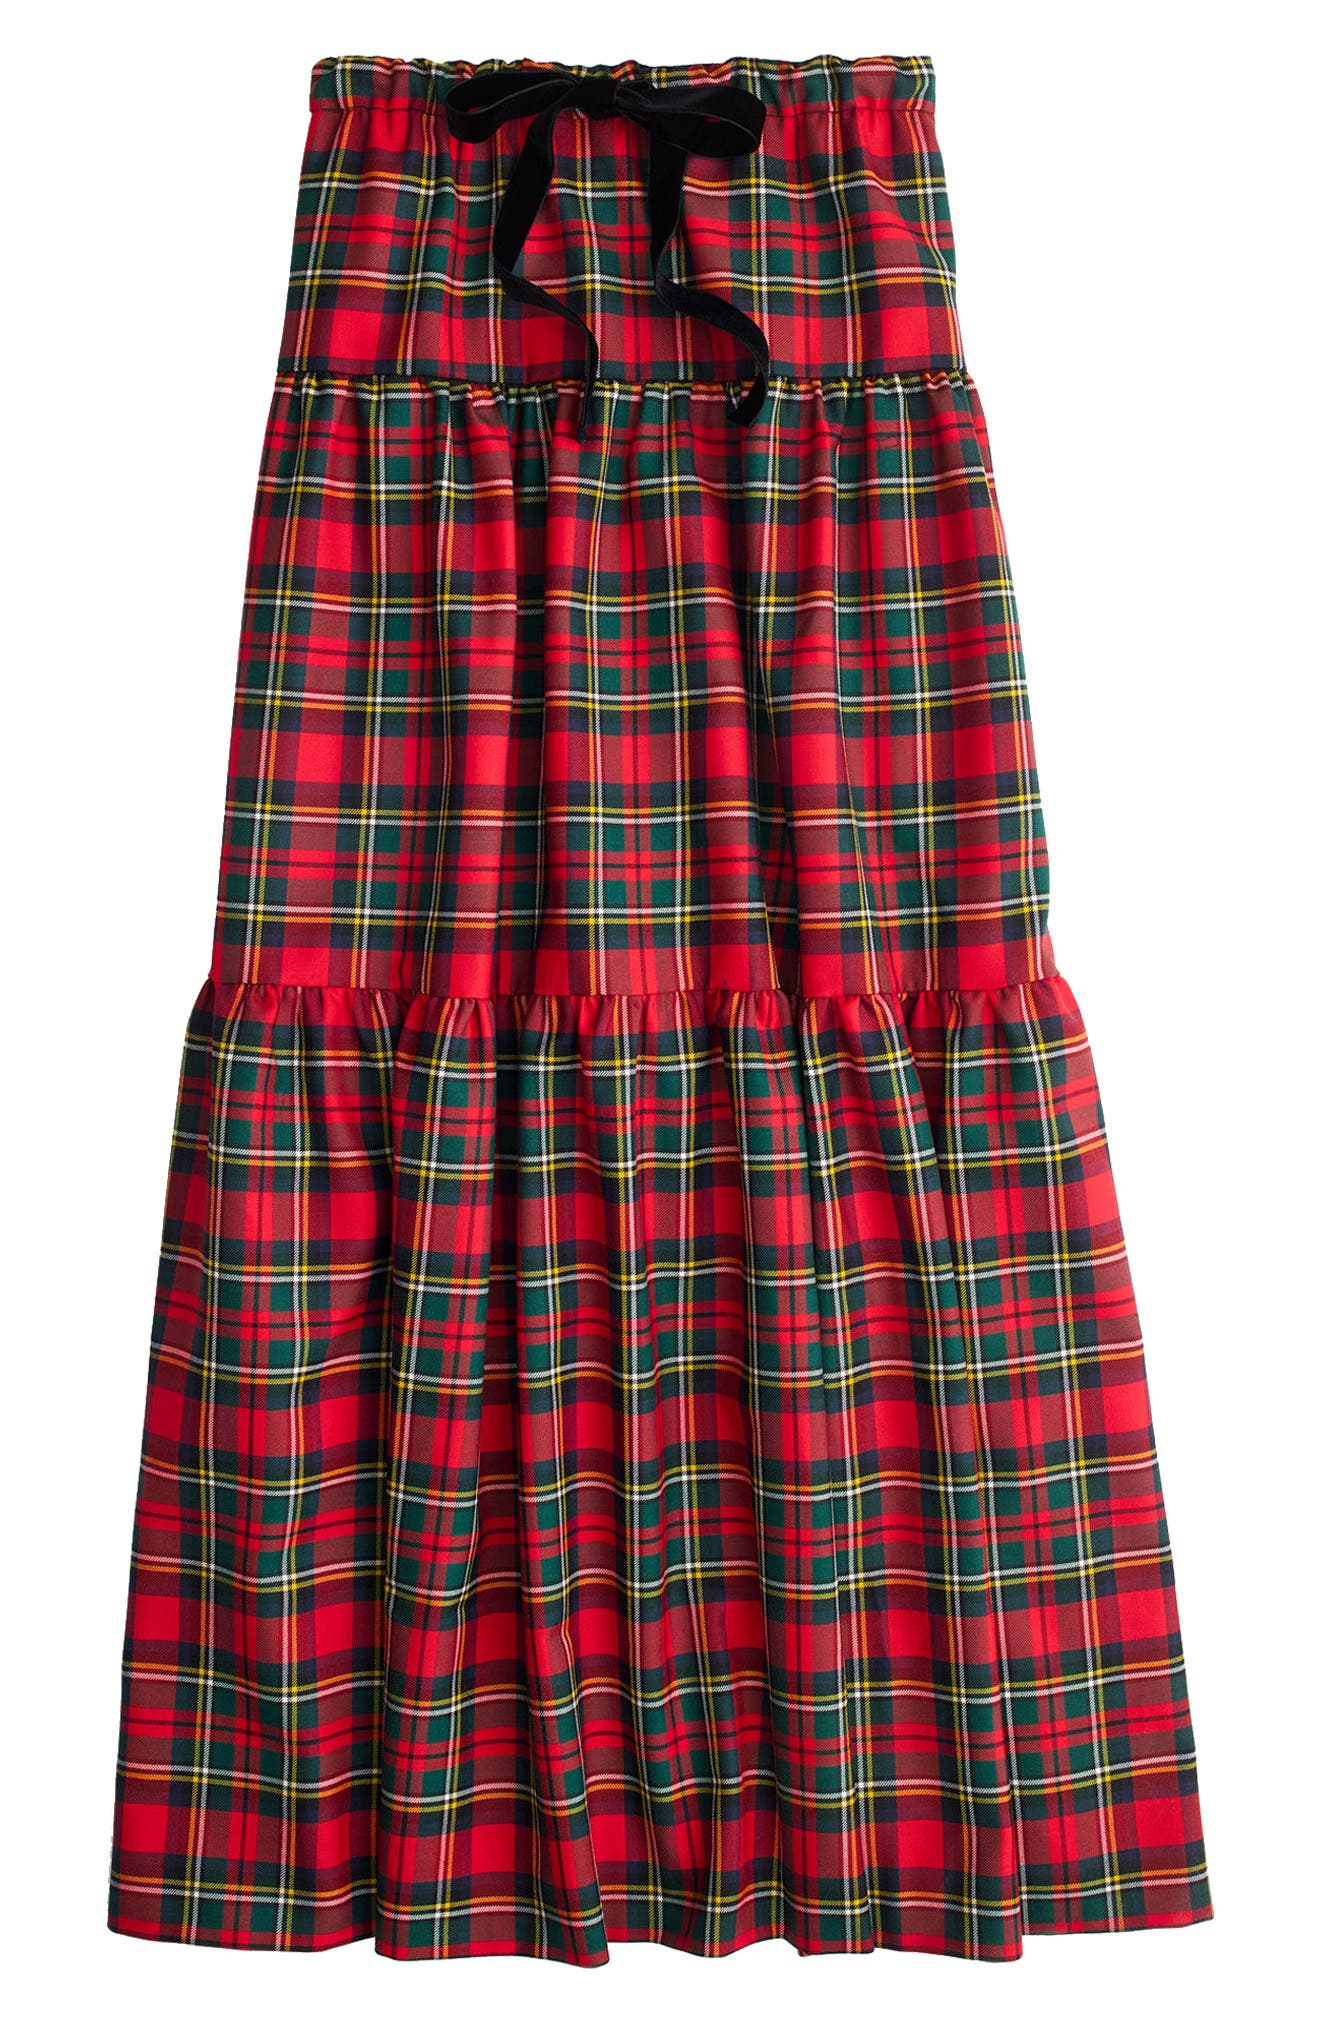 Tartan Plaid Tiered Maxi Skirt,                             Alternate thumbnail 3, color,                             600